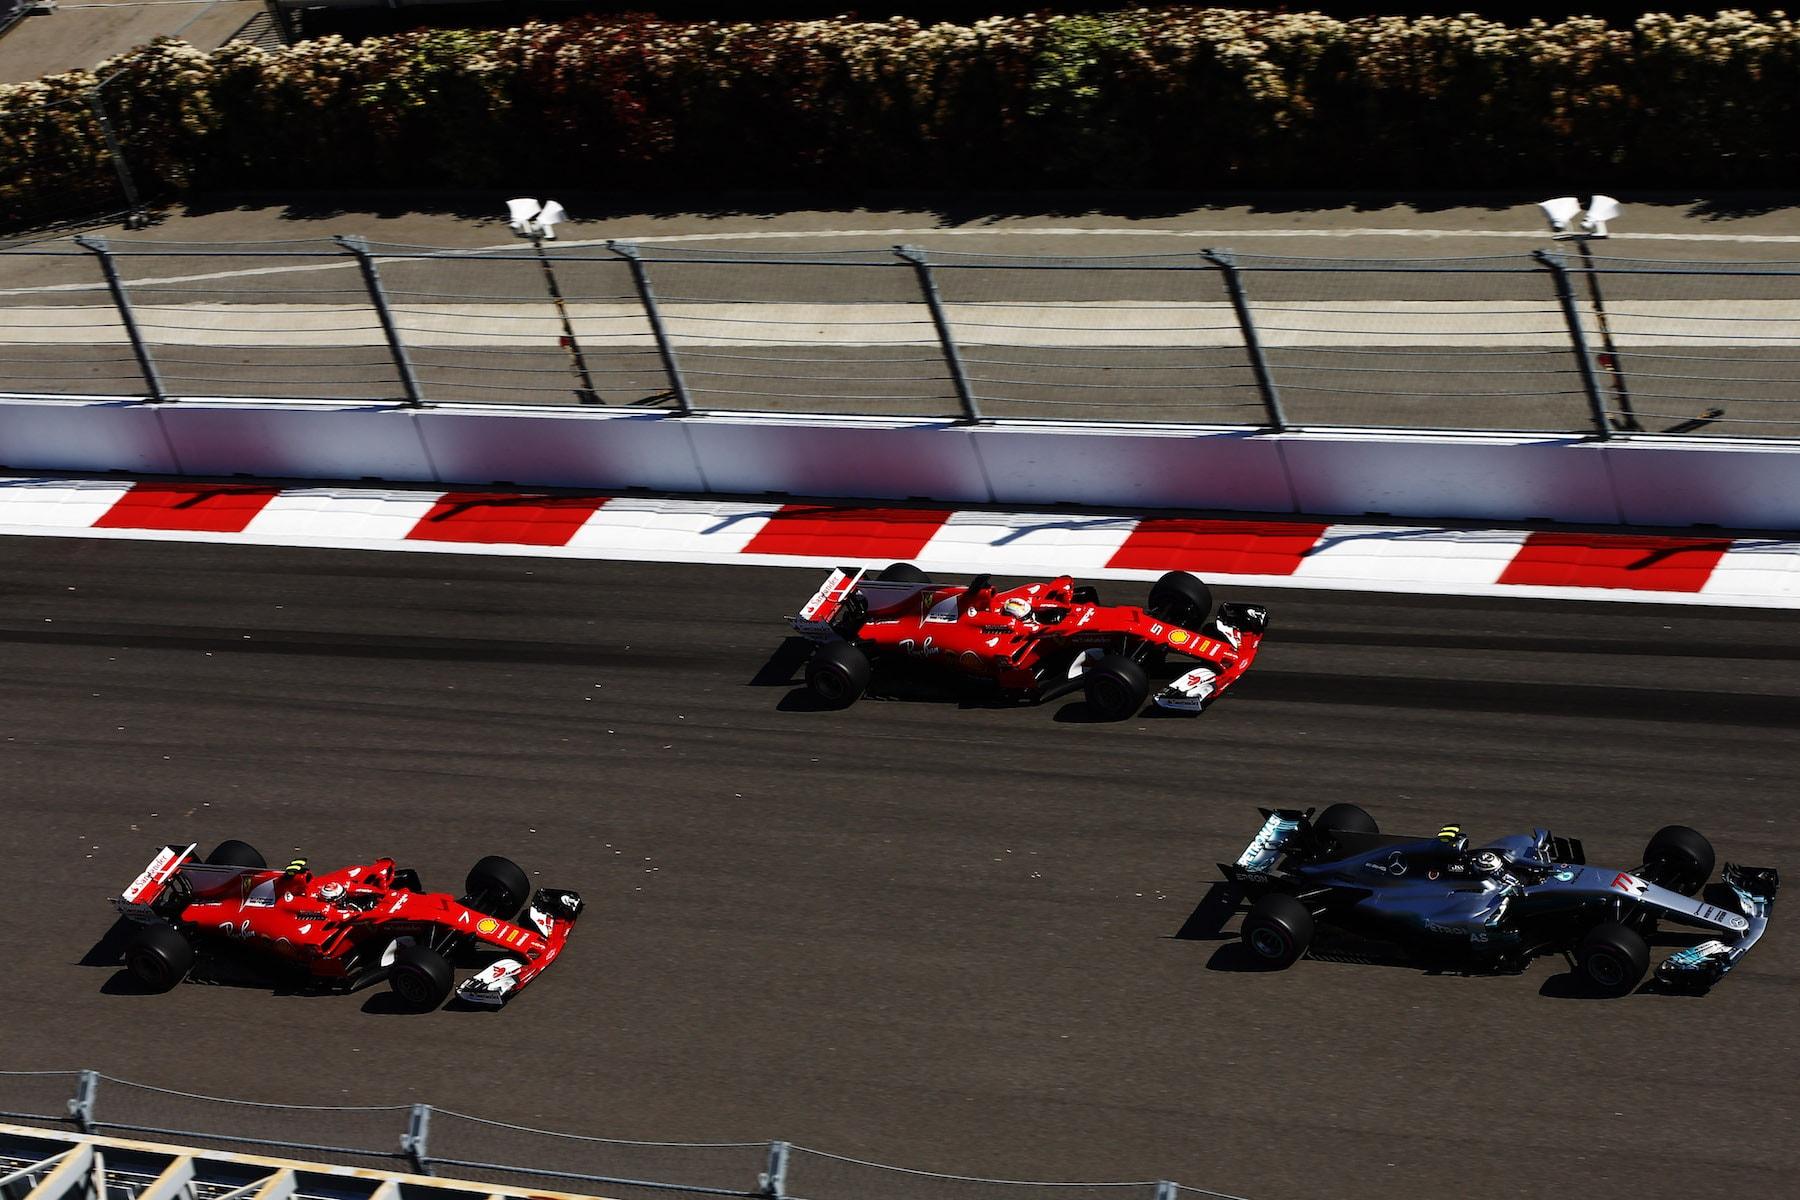 C 2017 Valtteri Bottas | Mercedes W08 | 2017 Russian GP winner 6 copy.jpg